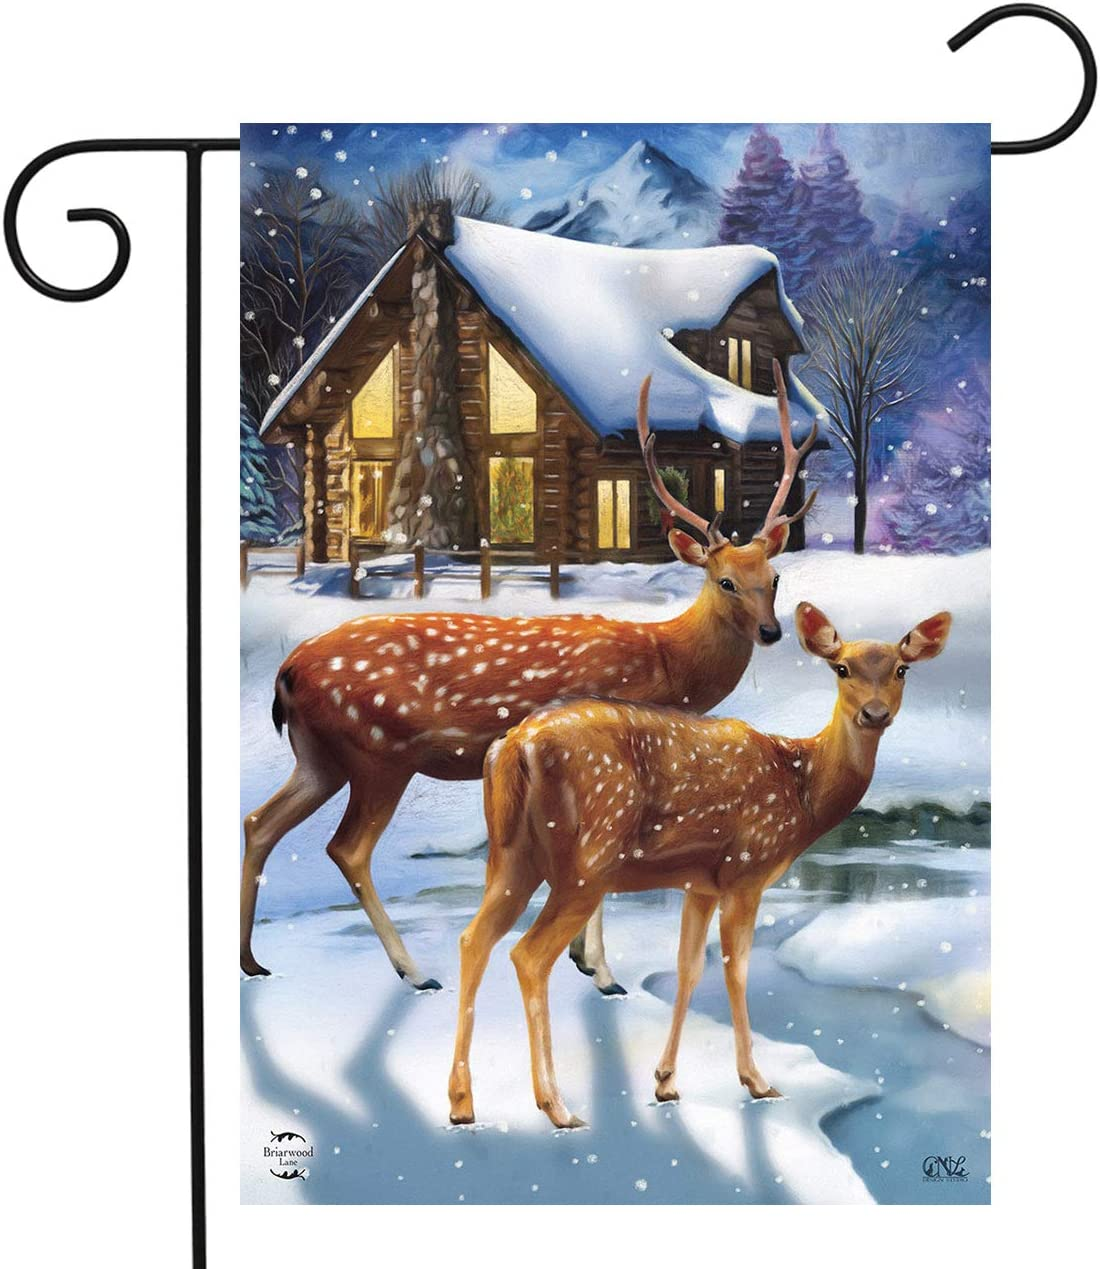 Briarwood Lane Winter Cabin Deer Garden Flag Snowy Scene 12.5